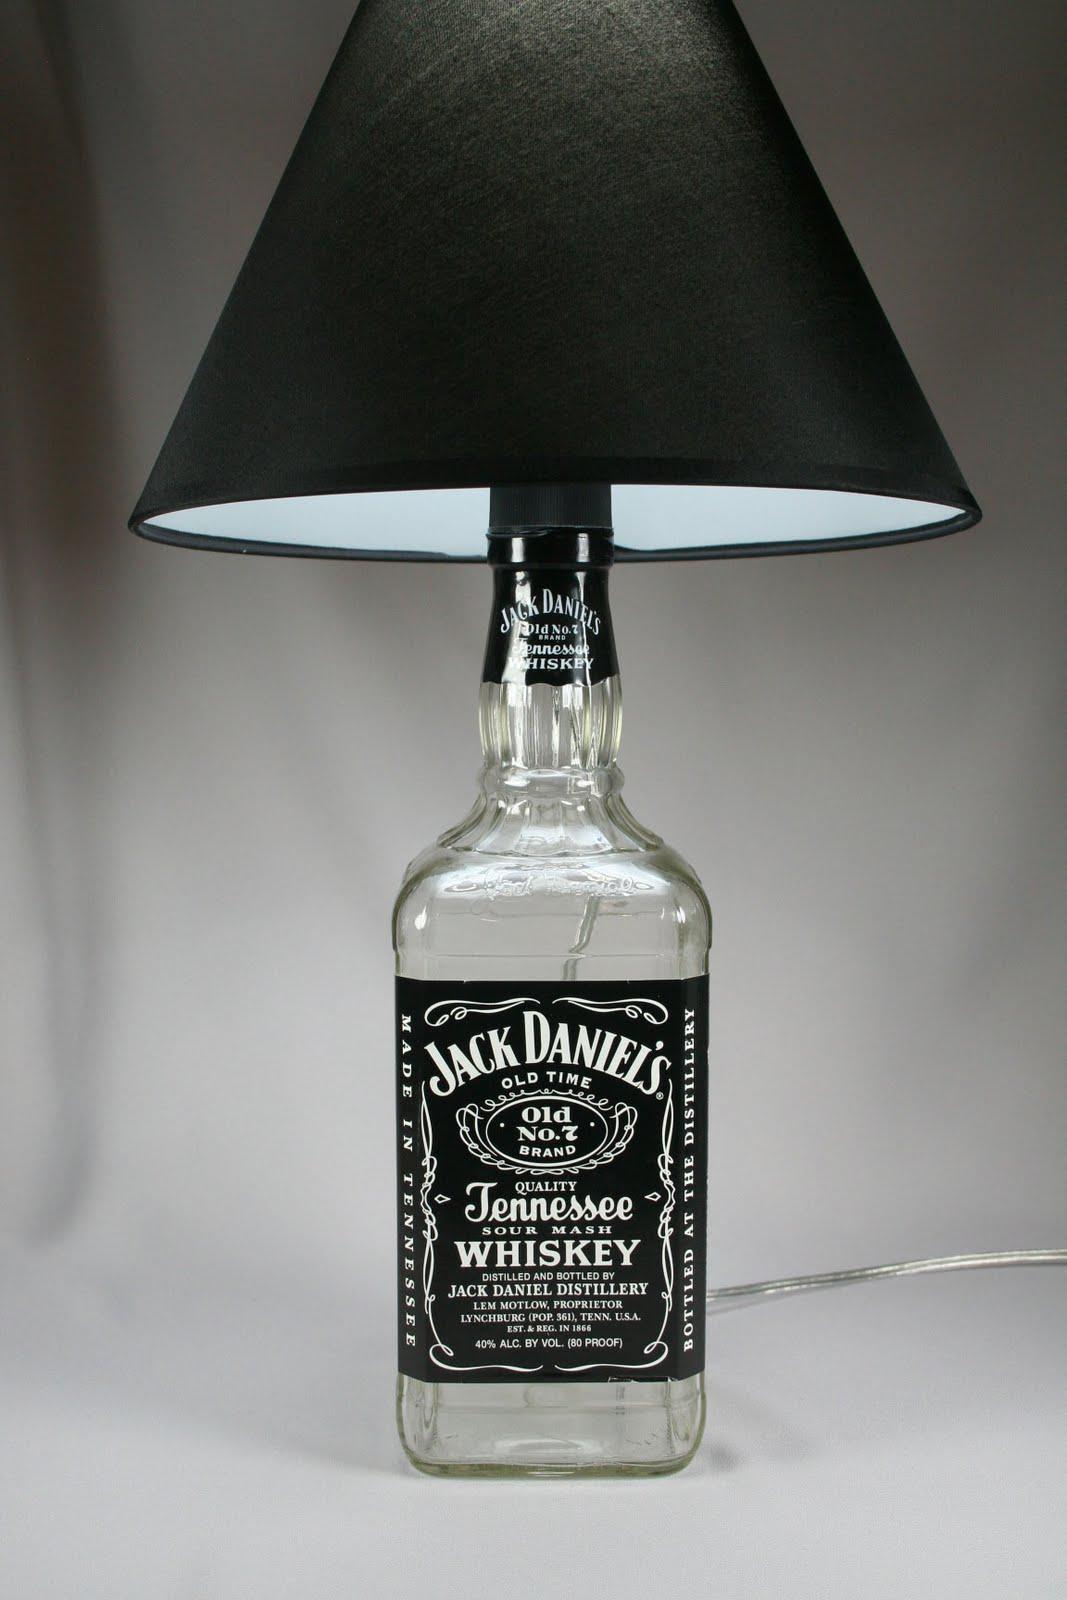 Shifflett studios funky new bottle lamps for Lamps made out of wine bottles